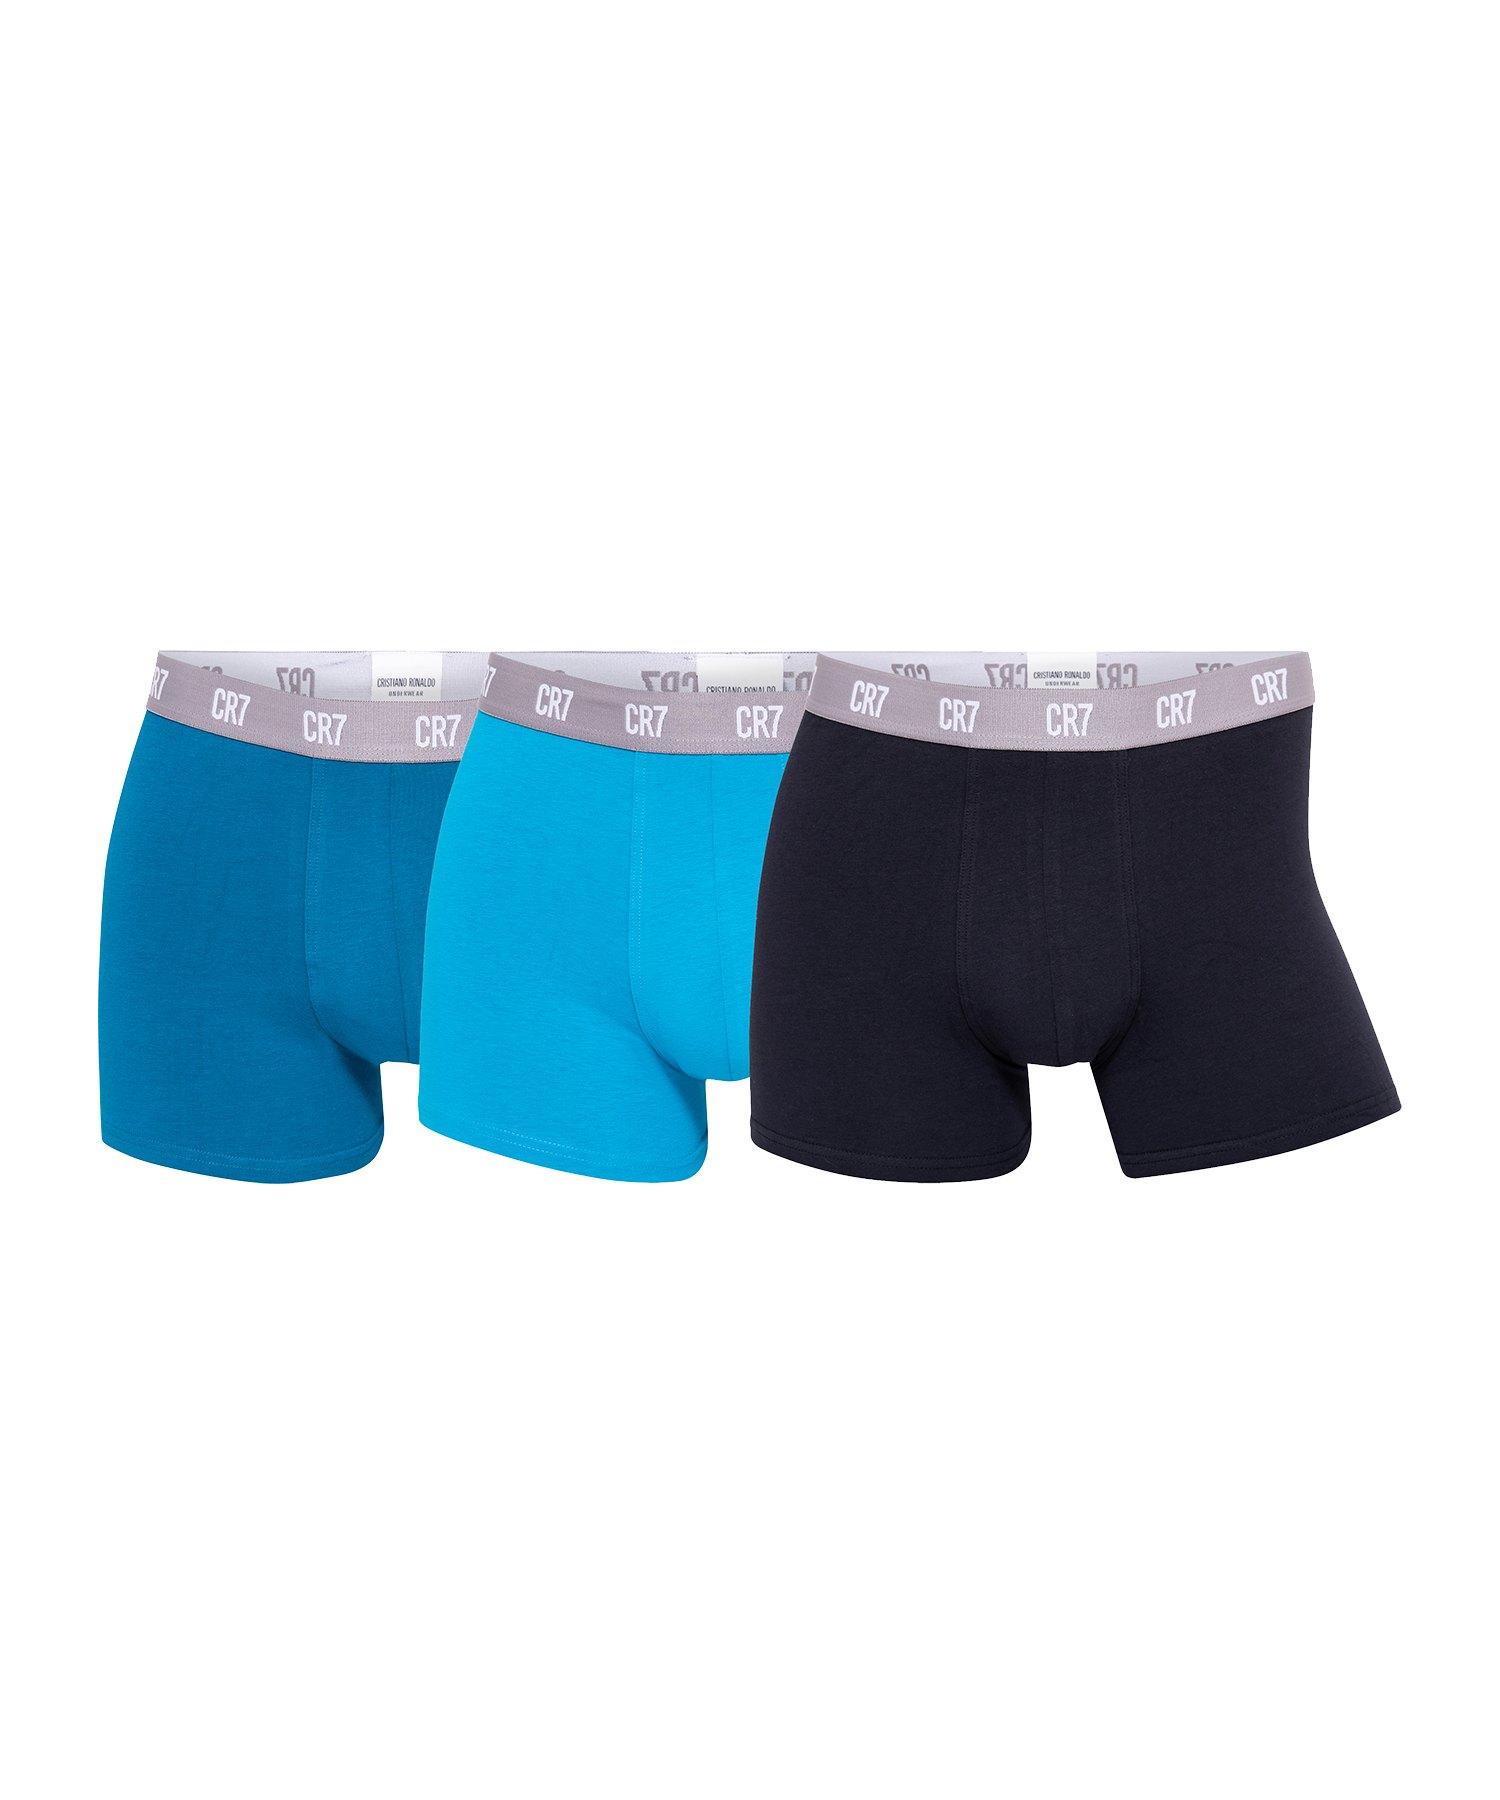 CR7 Basic Boxershort 3er Pack Schwarz Blau - schwarz